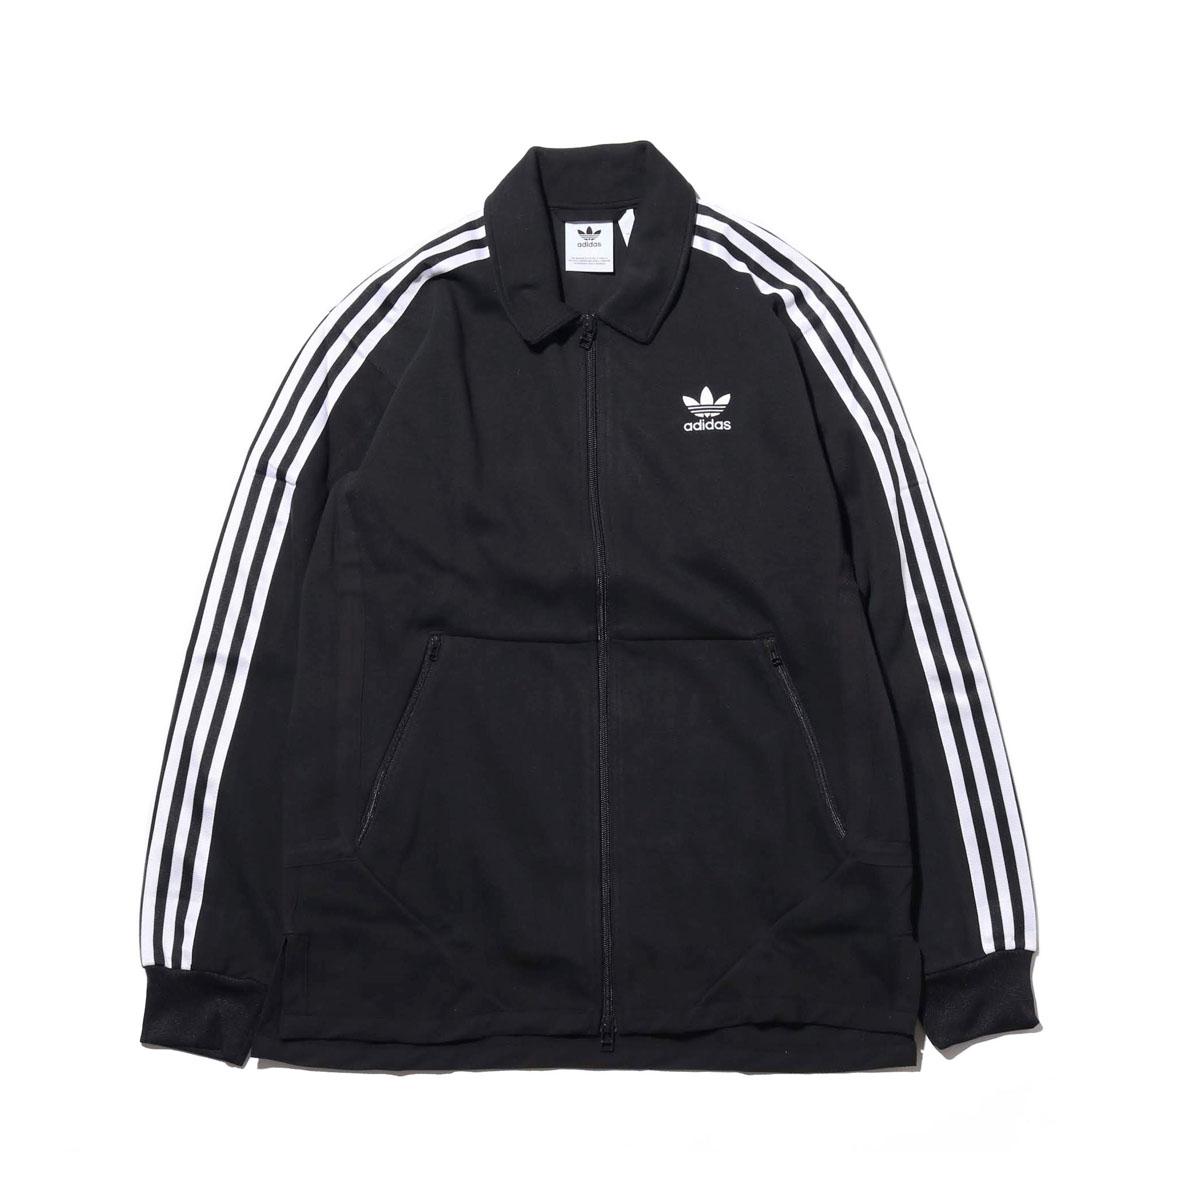 adidas Originals WINDSOR TRACK TOP(アディダス オリジナルス WINDSORトラックトップ)BLACK【メンズ ジャケット】18FW-I